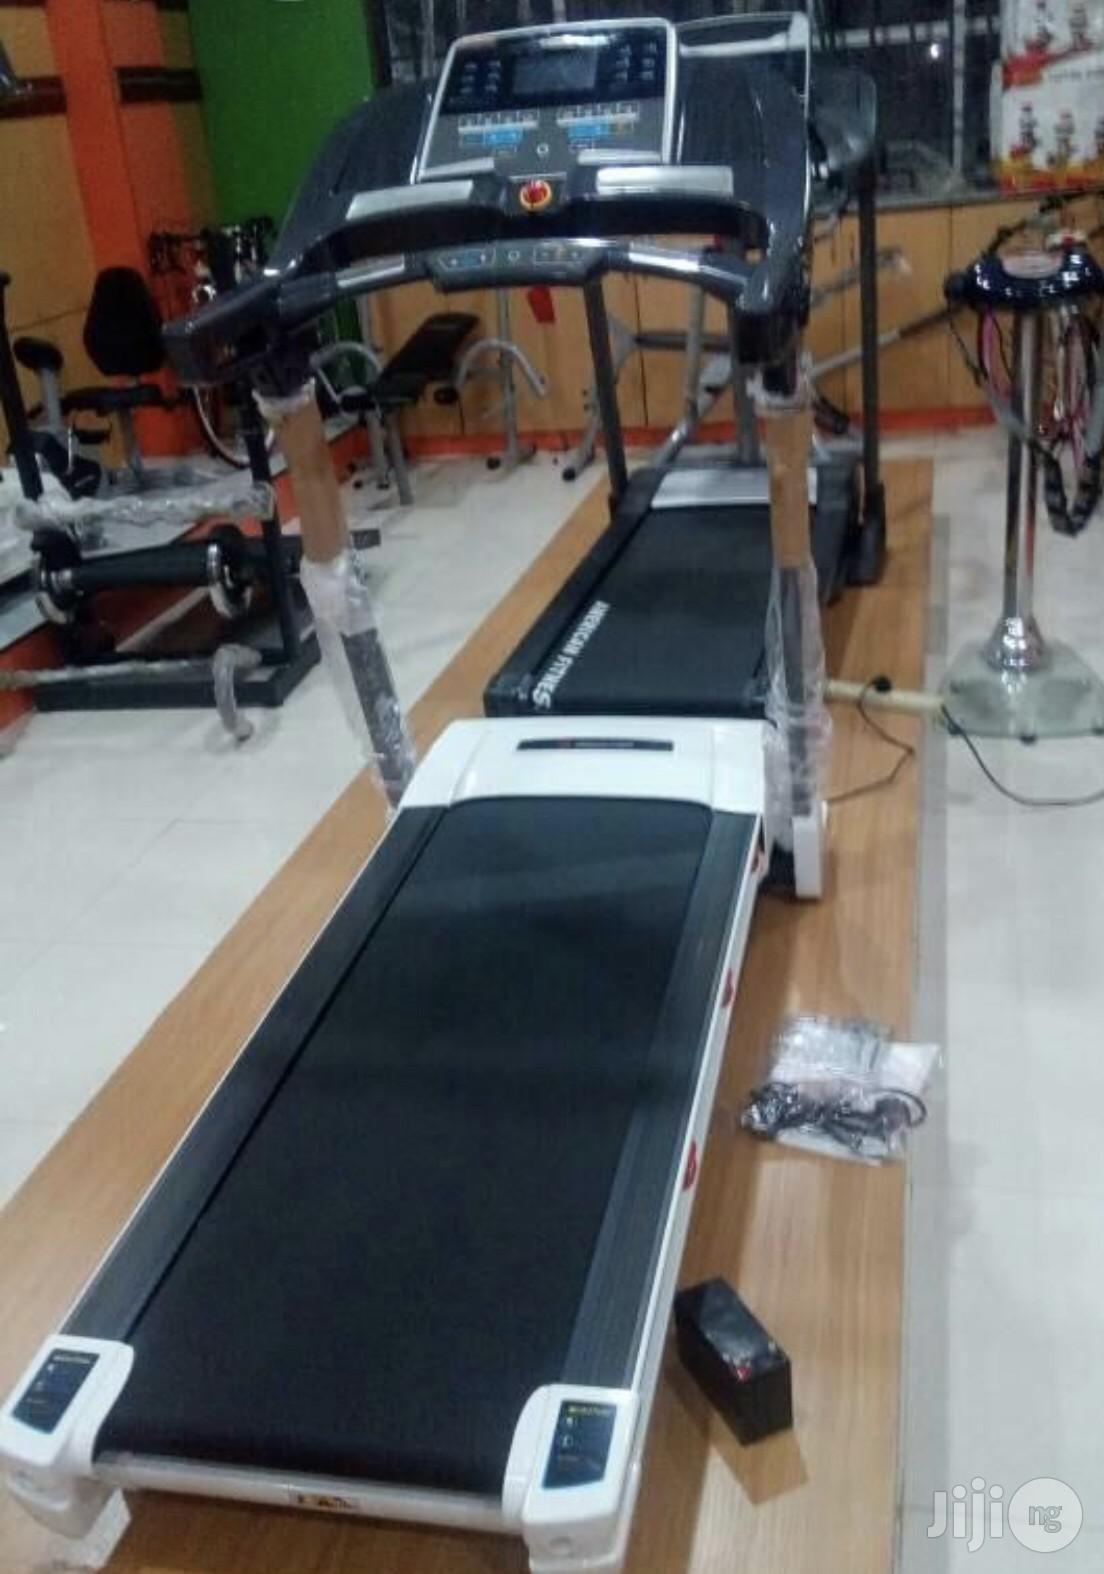 American Fitness Treadmill (3hp)